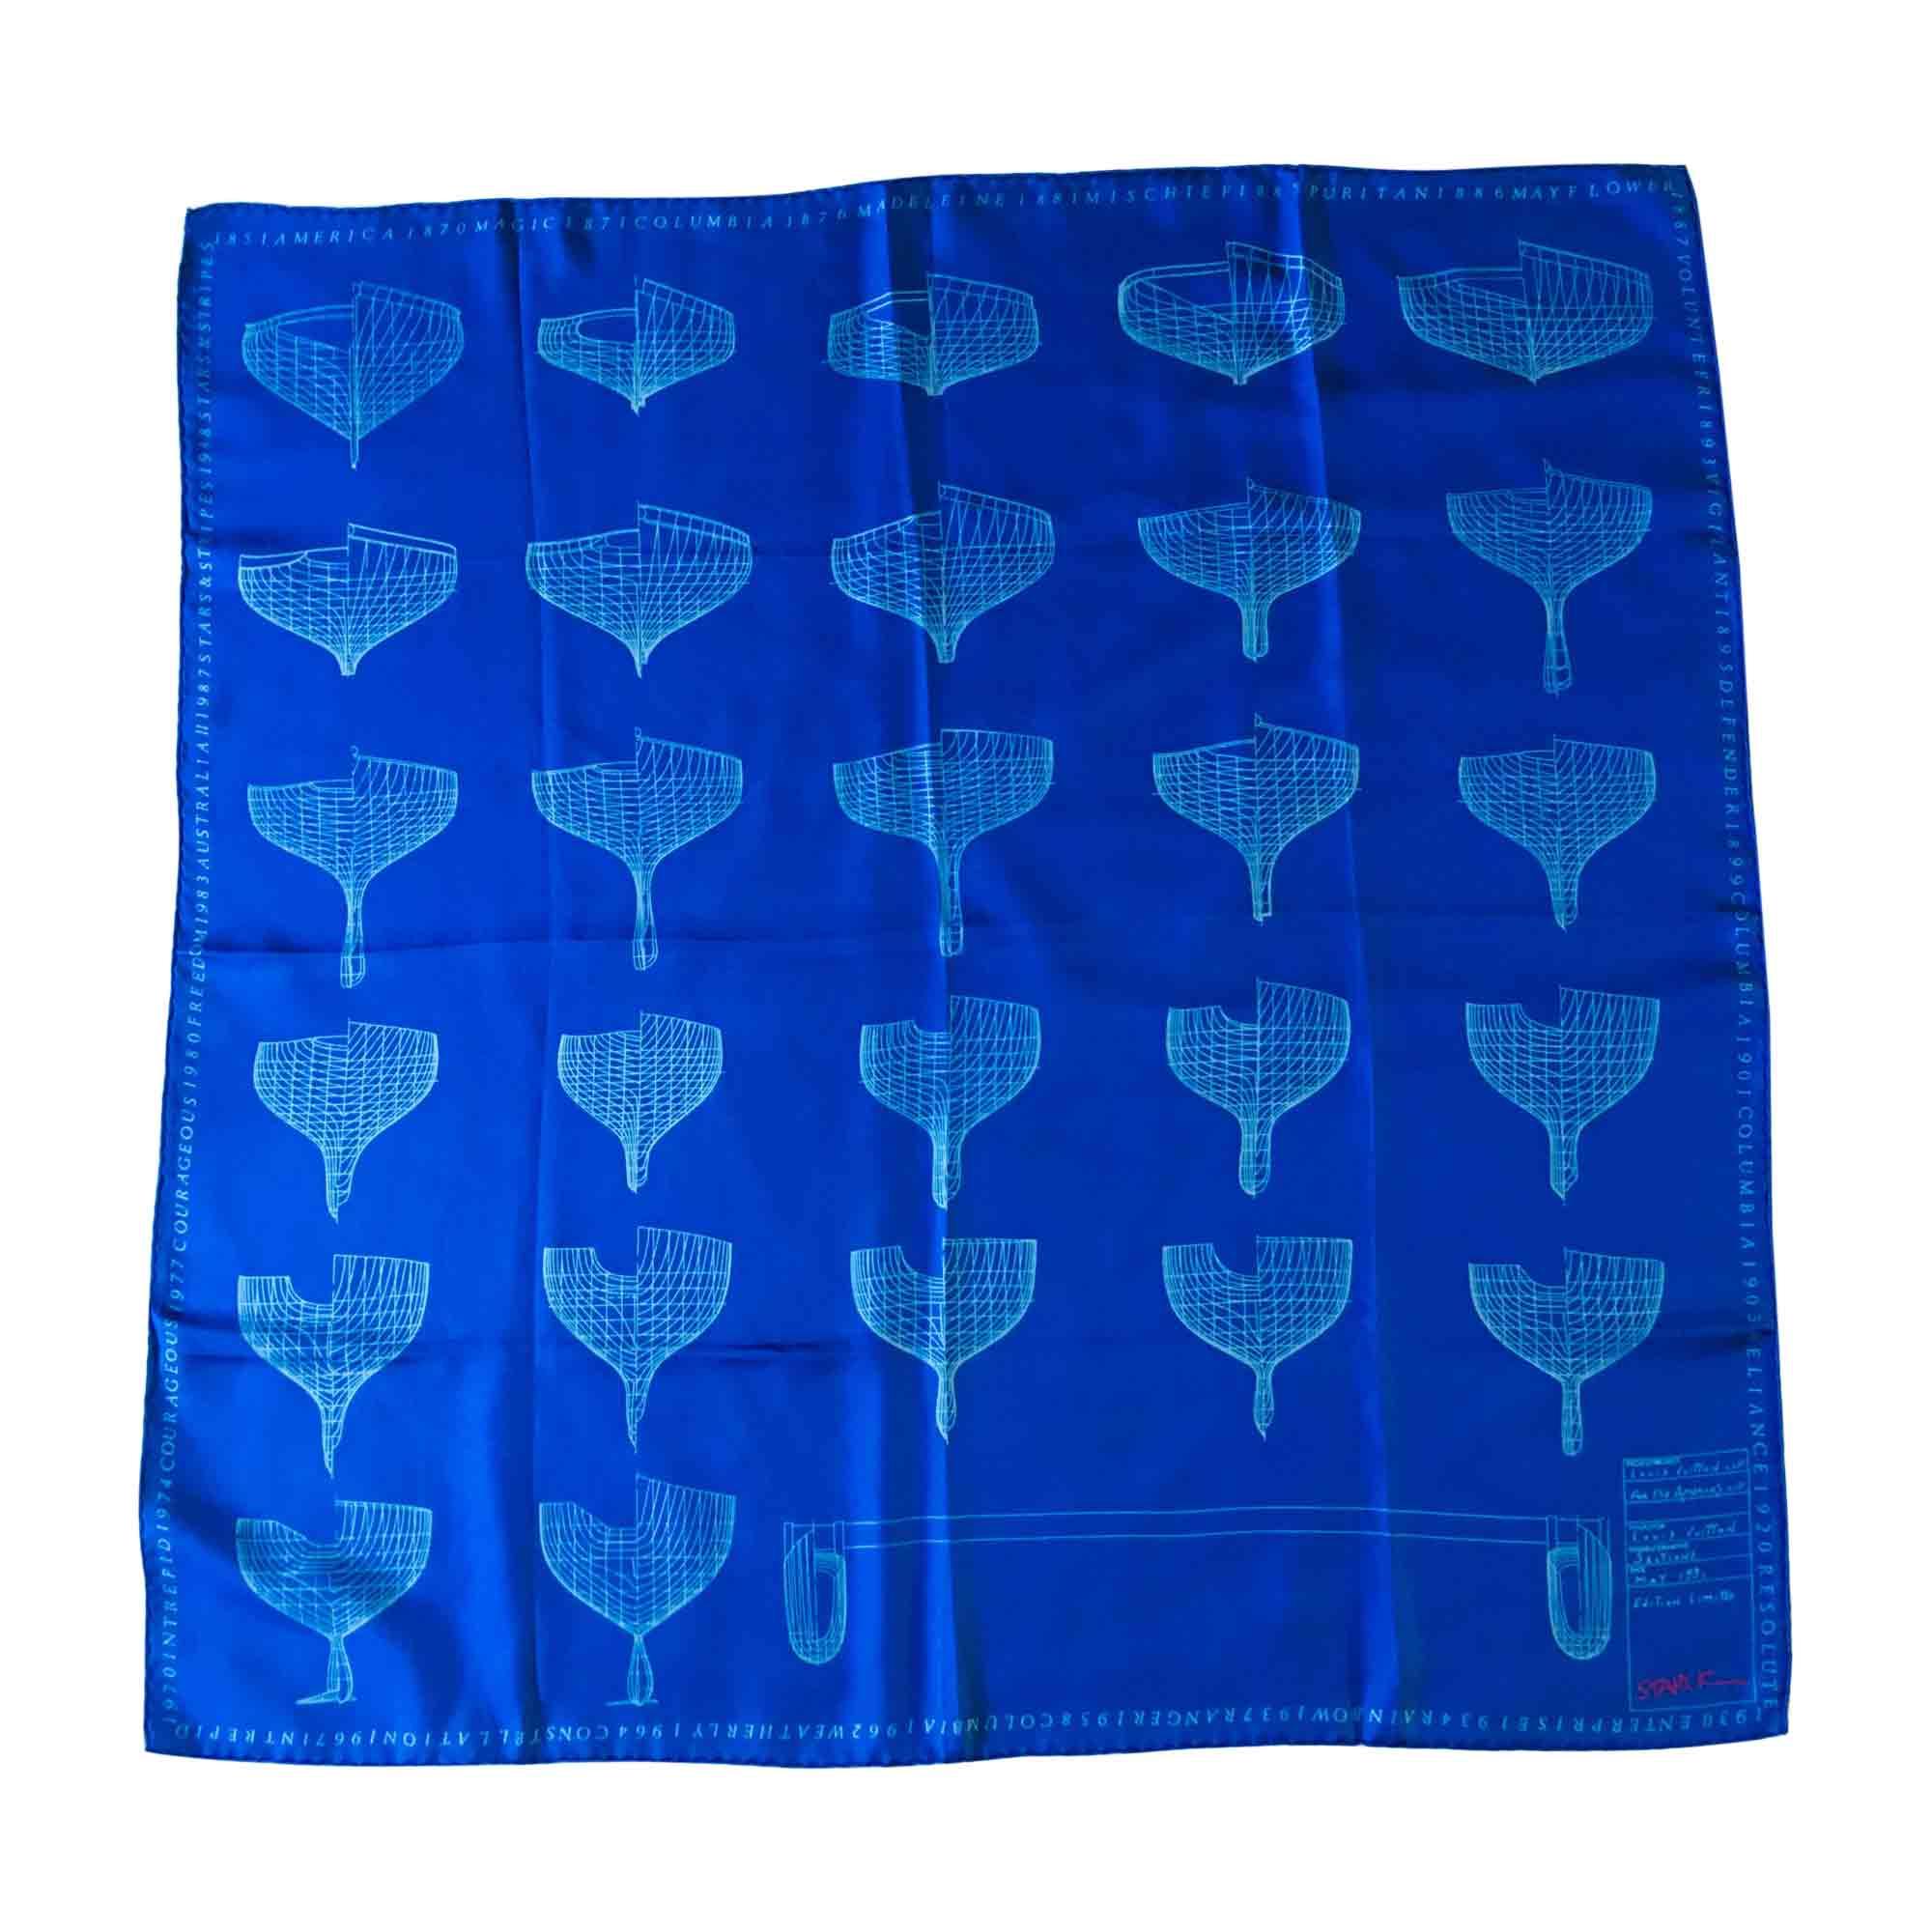 Foulard LOUIS VUITTON Bleu, bleu marine, bleu turquoise 5d99c26c5b3